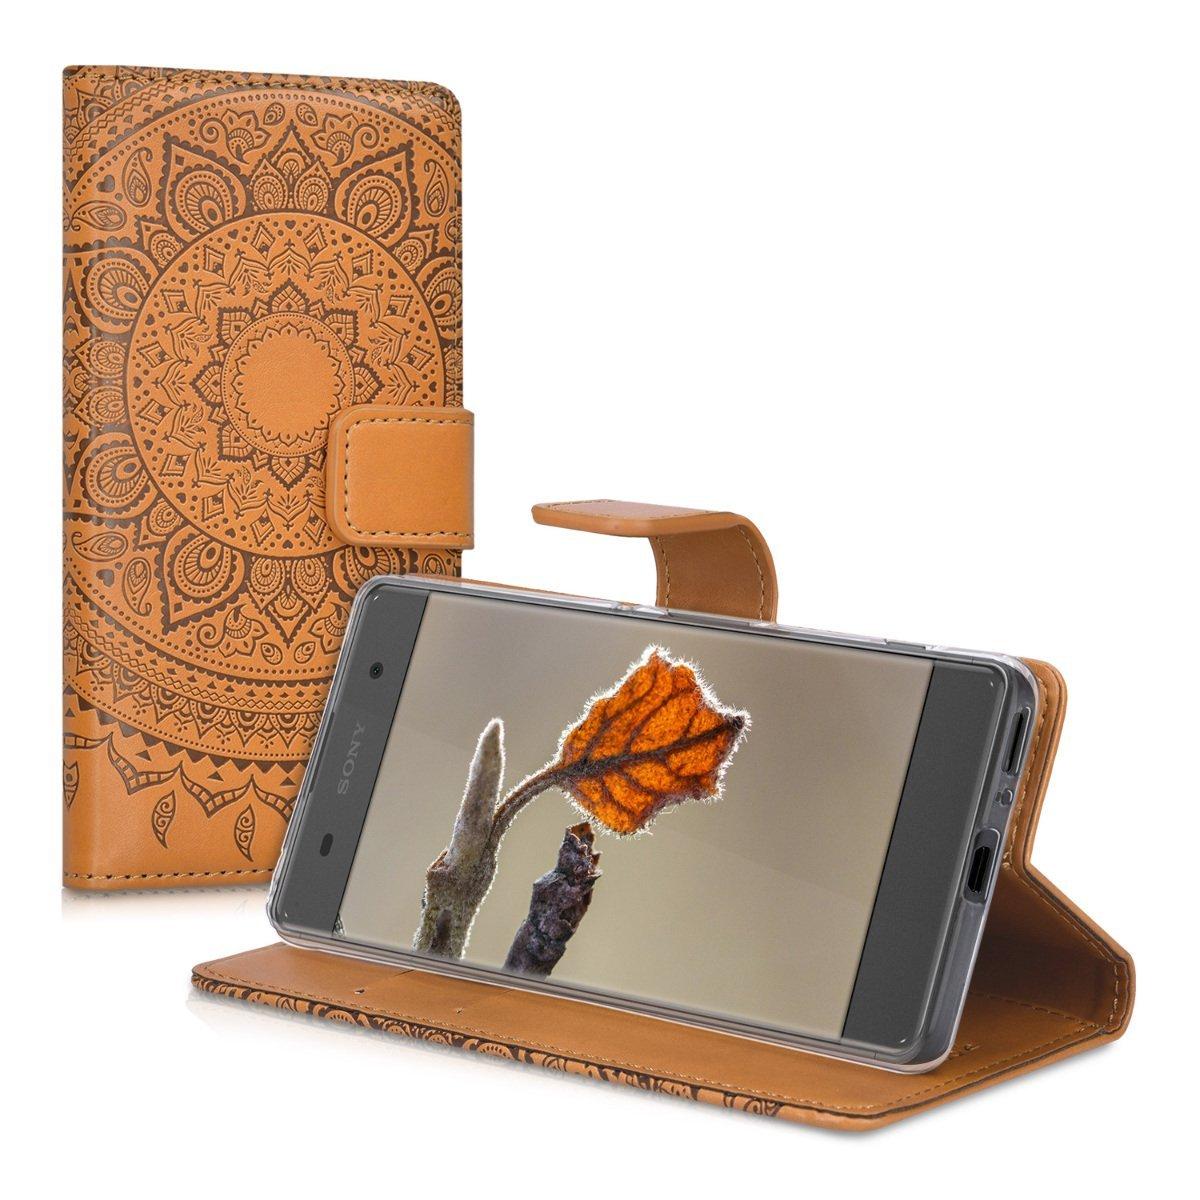 KW Θήκη Sony Xperia XA - Indian Sun in Dark Brown/ Light Brown (37315.04) Πορτοφόλι